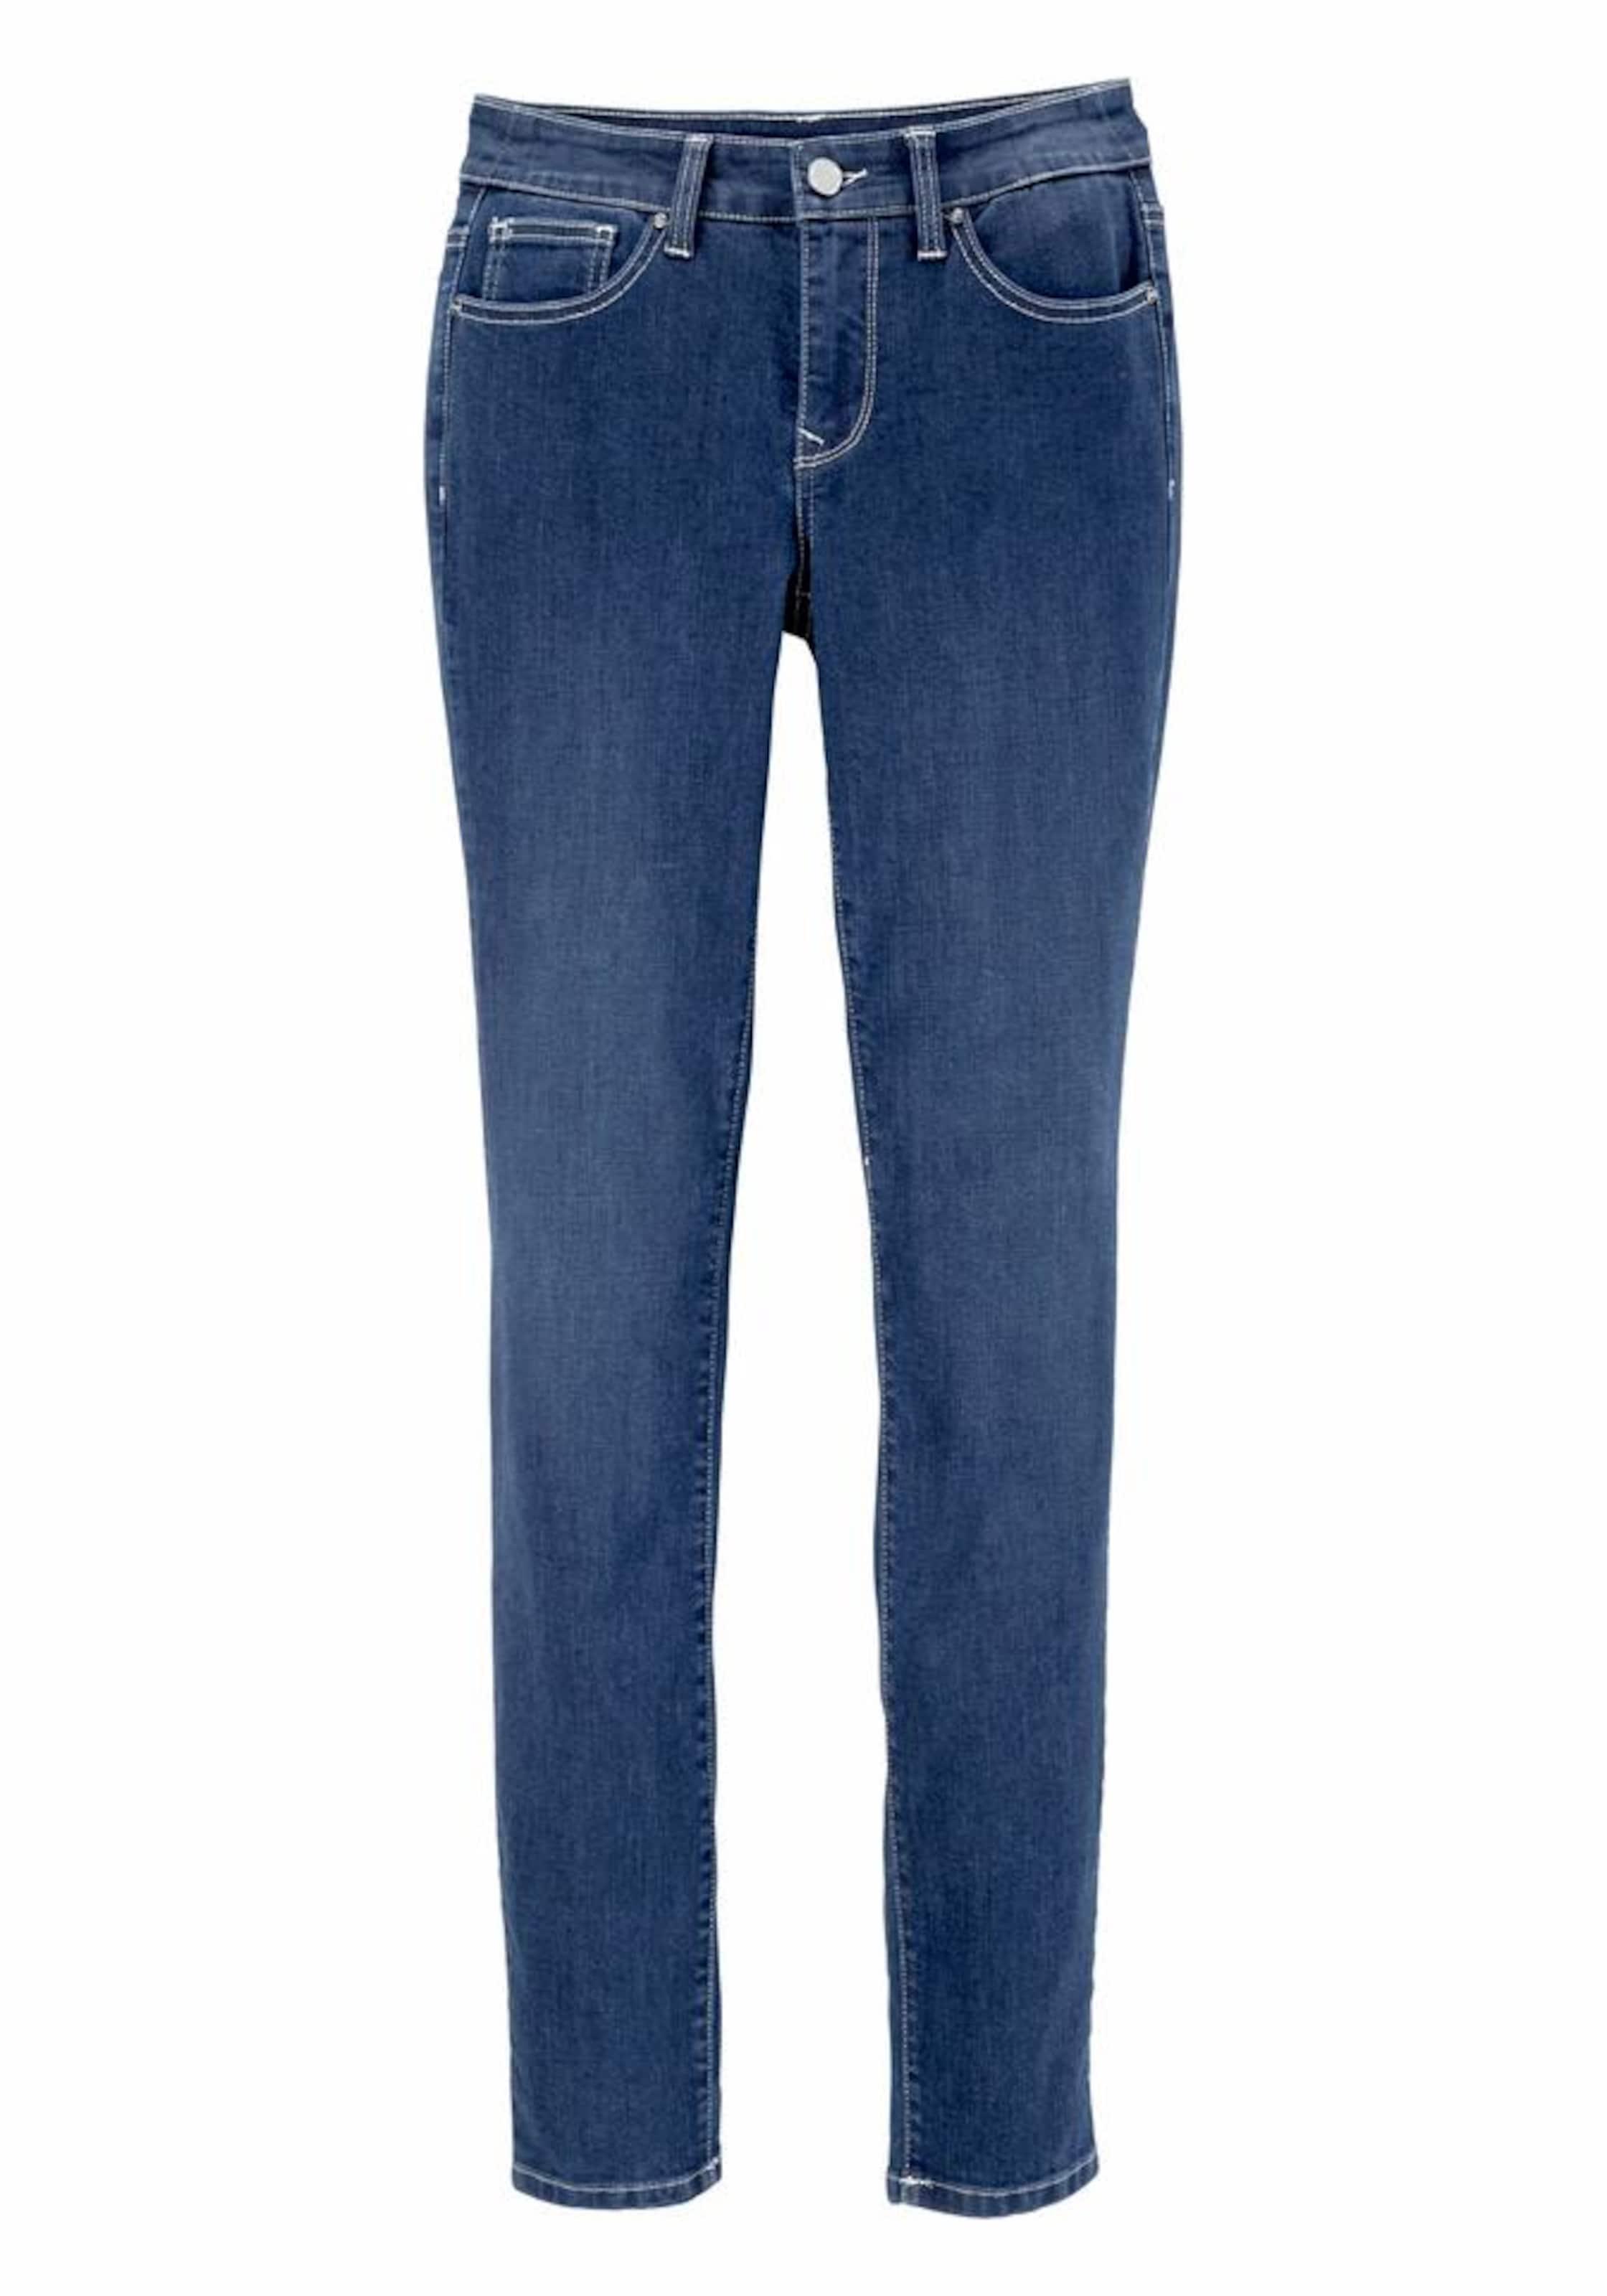 Denim Guido Jeans Kretschmer In Maria Blue fit Slim Nkn0wXP8O